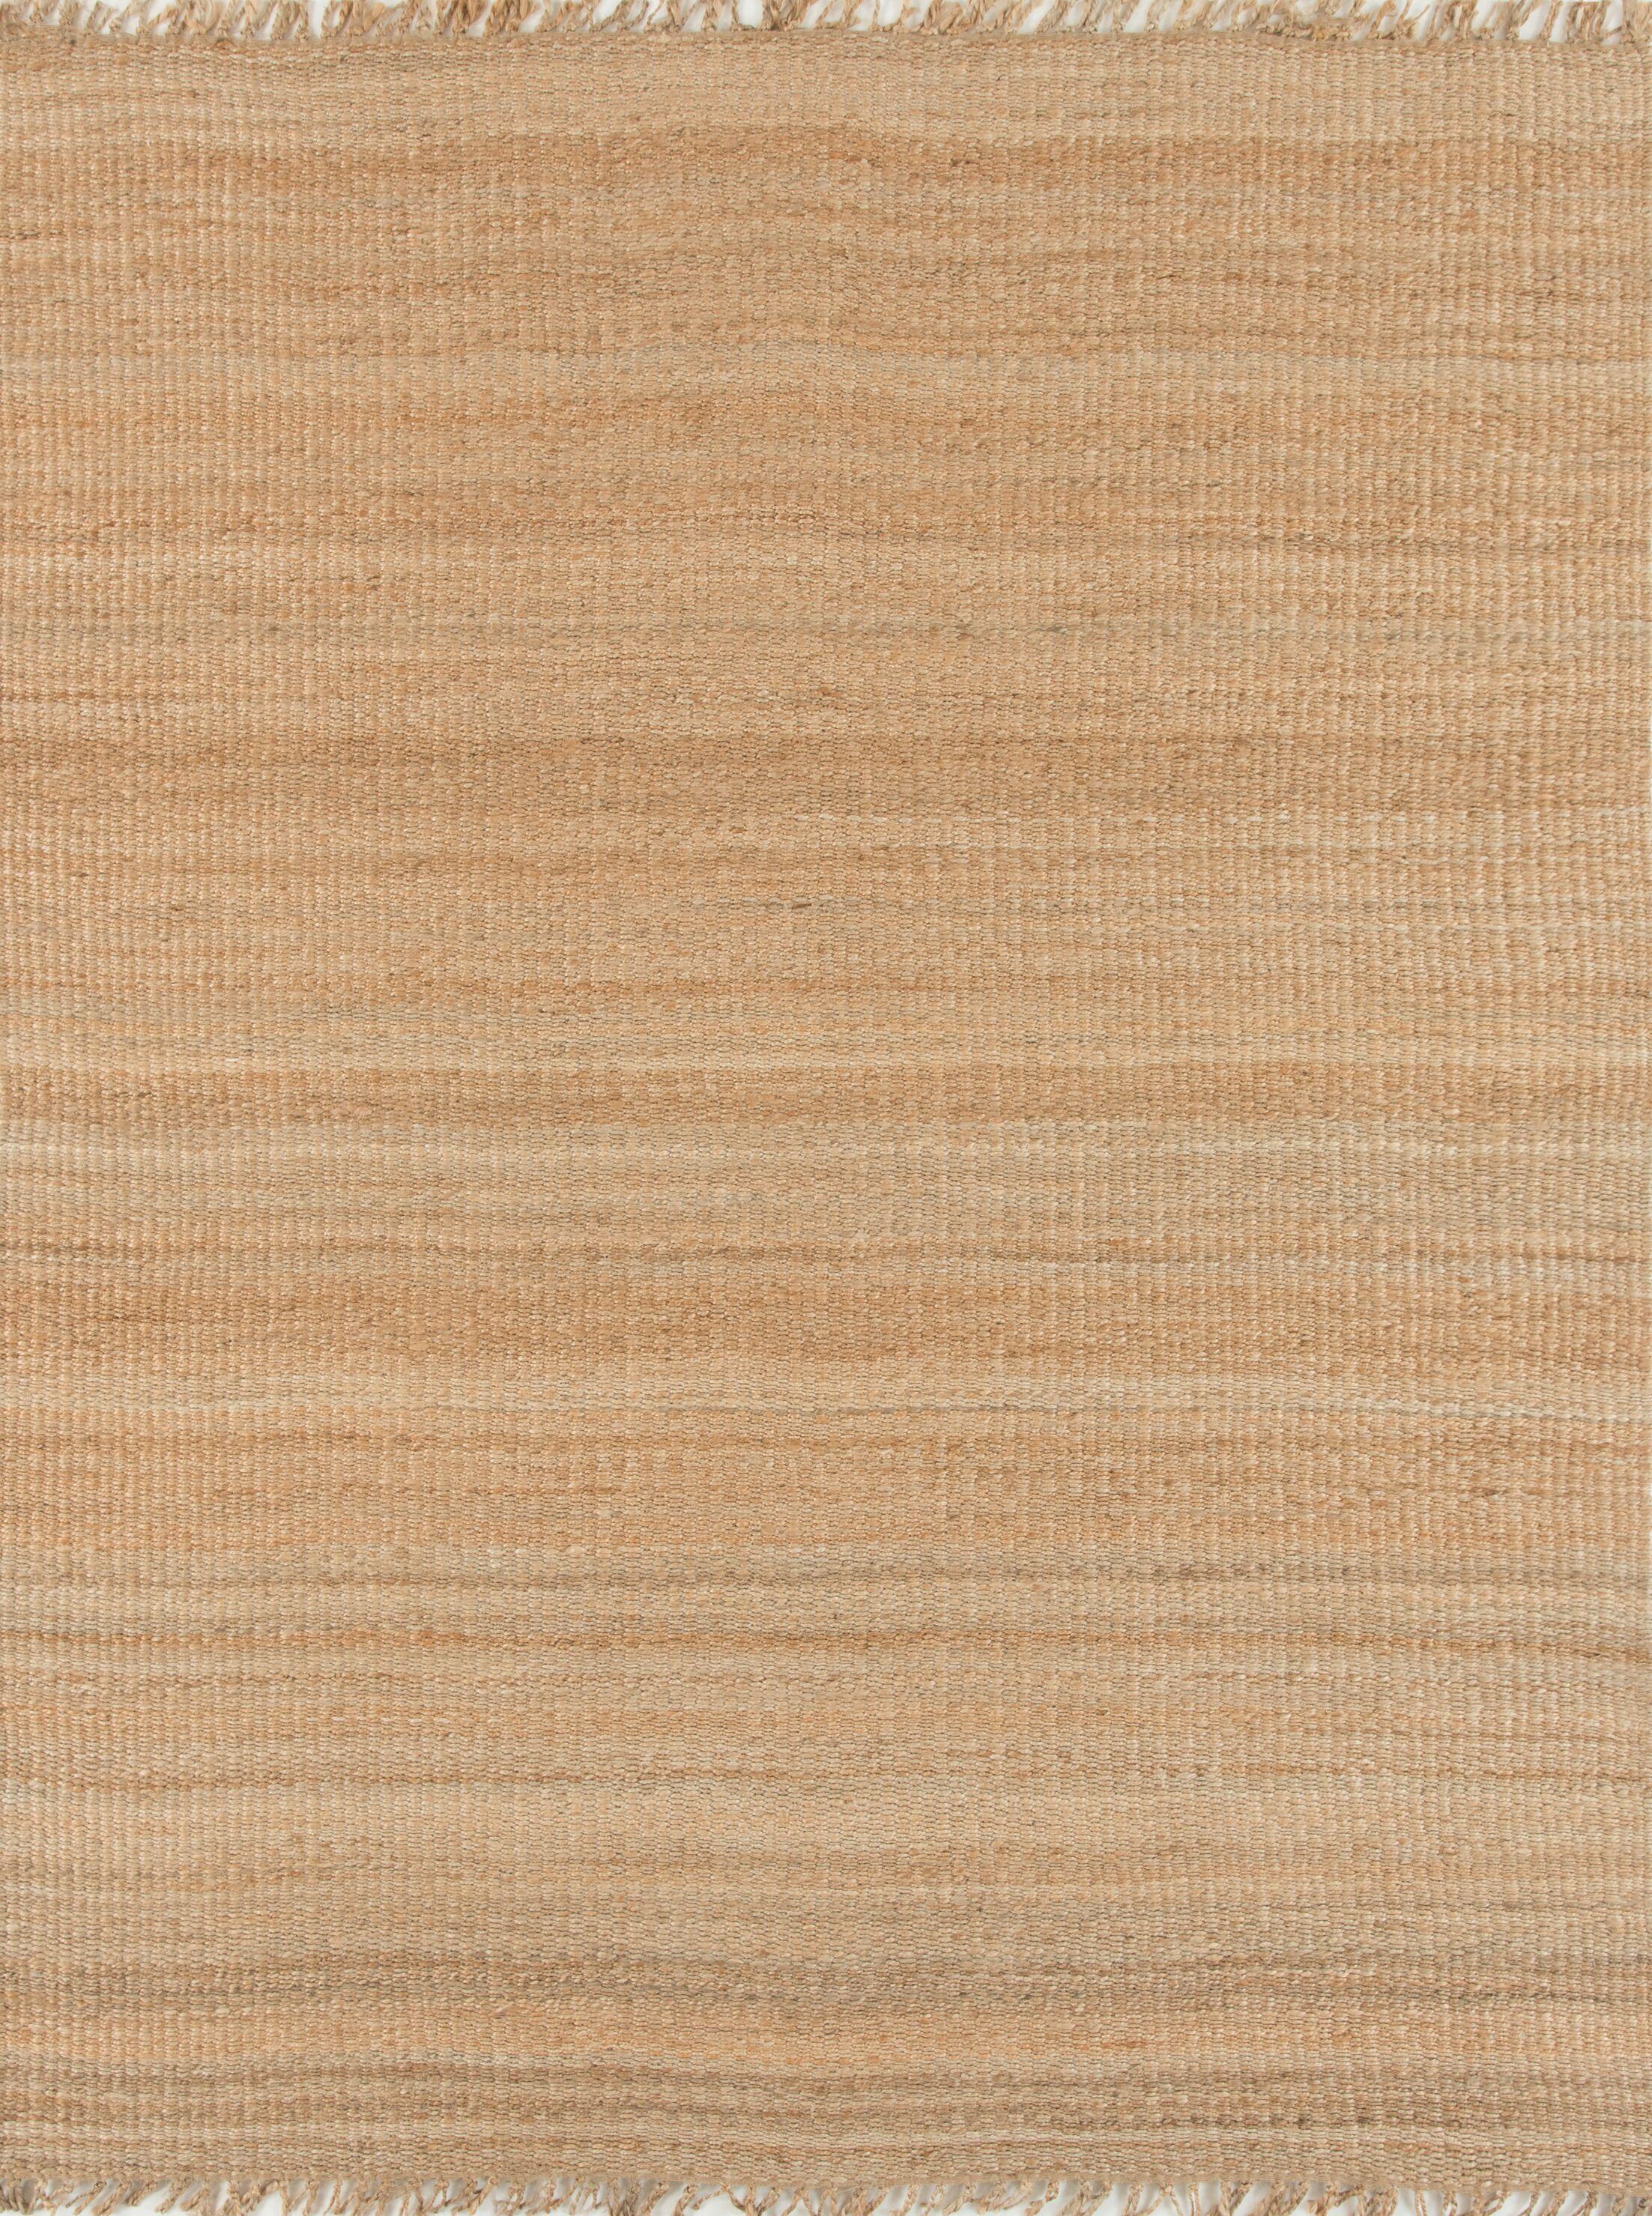 Hanlin Hand-Woven Brown Area Rug Rug Size: Rectangle 9' x 13'